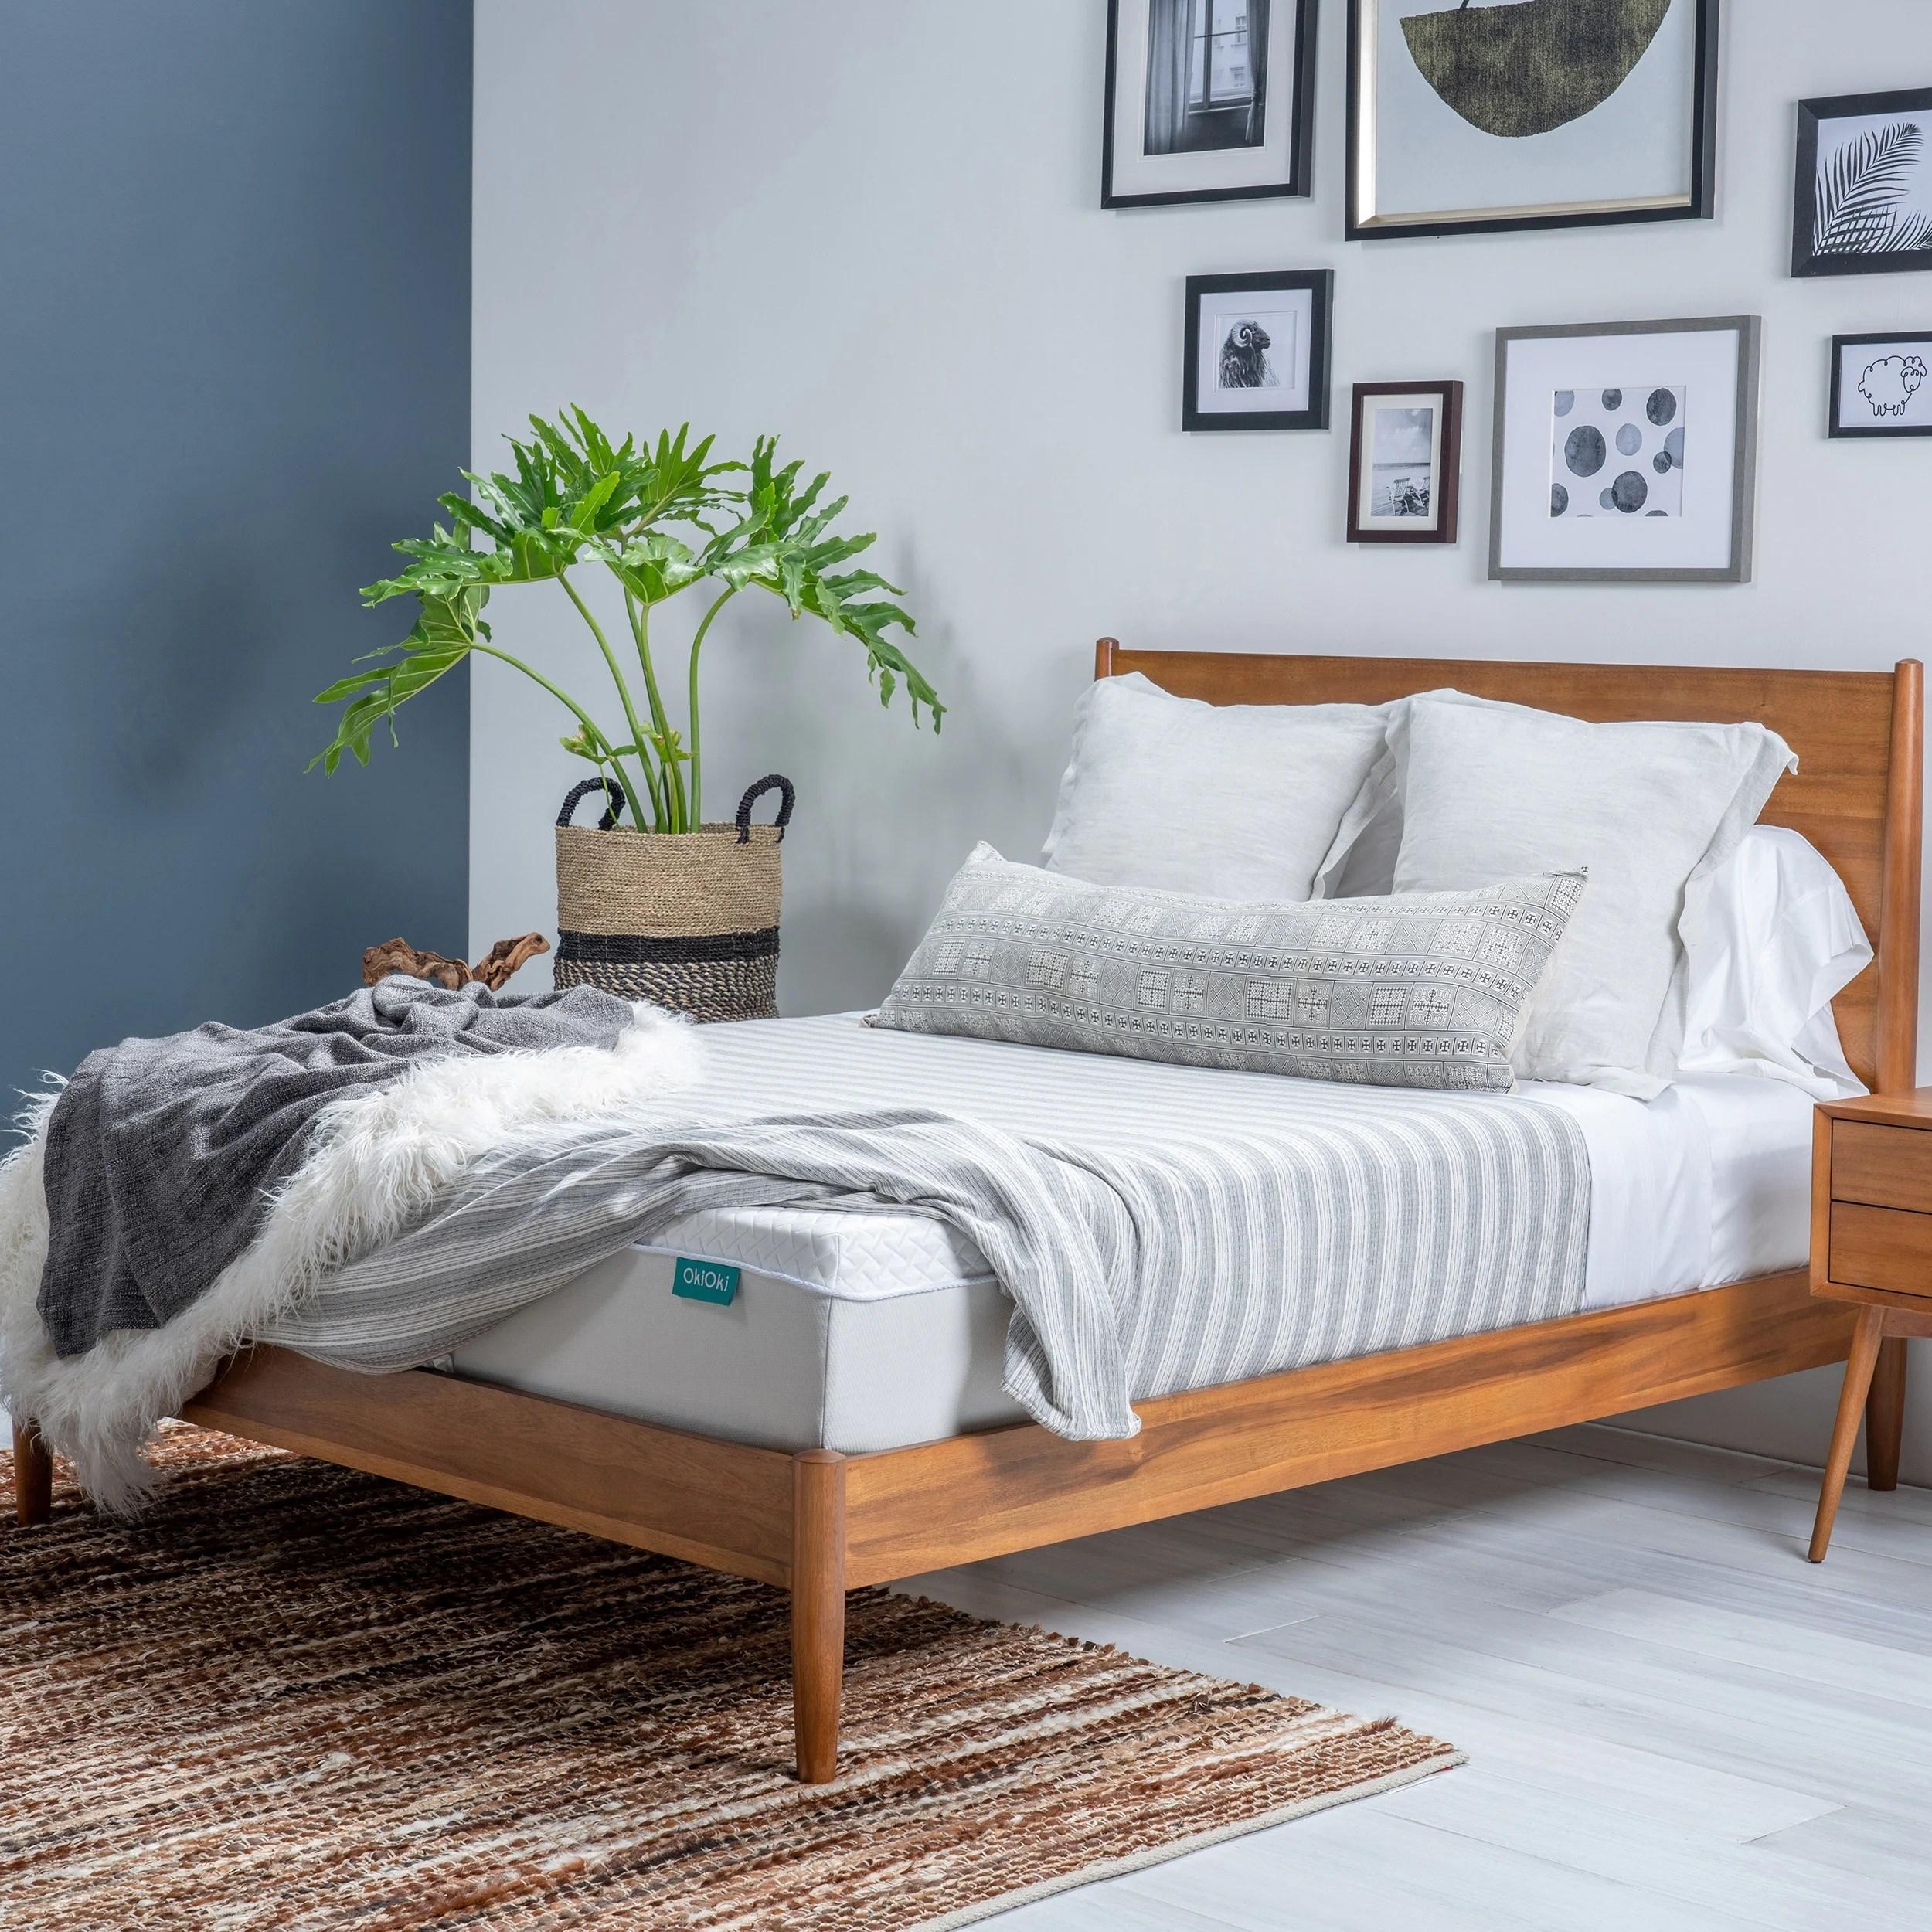 coil mattress matres image